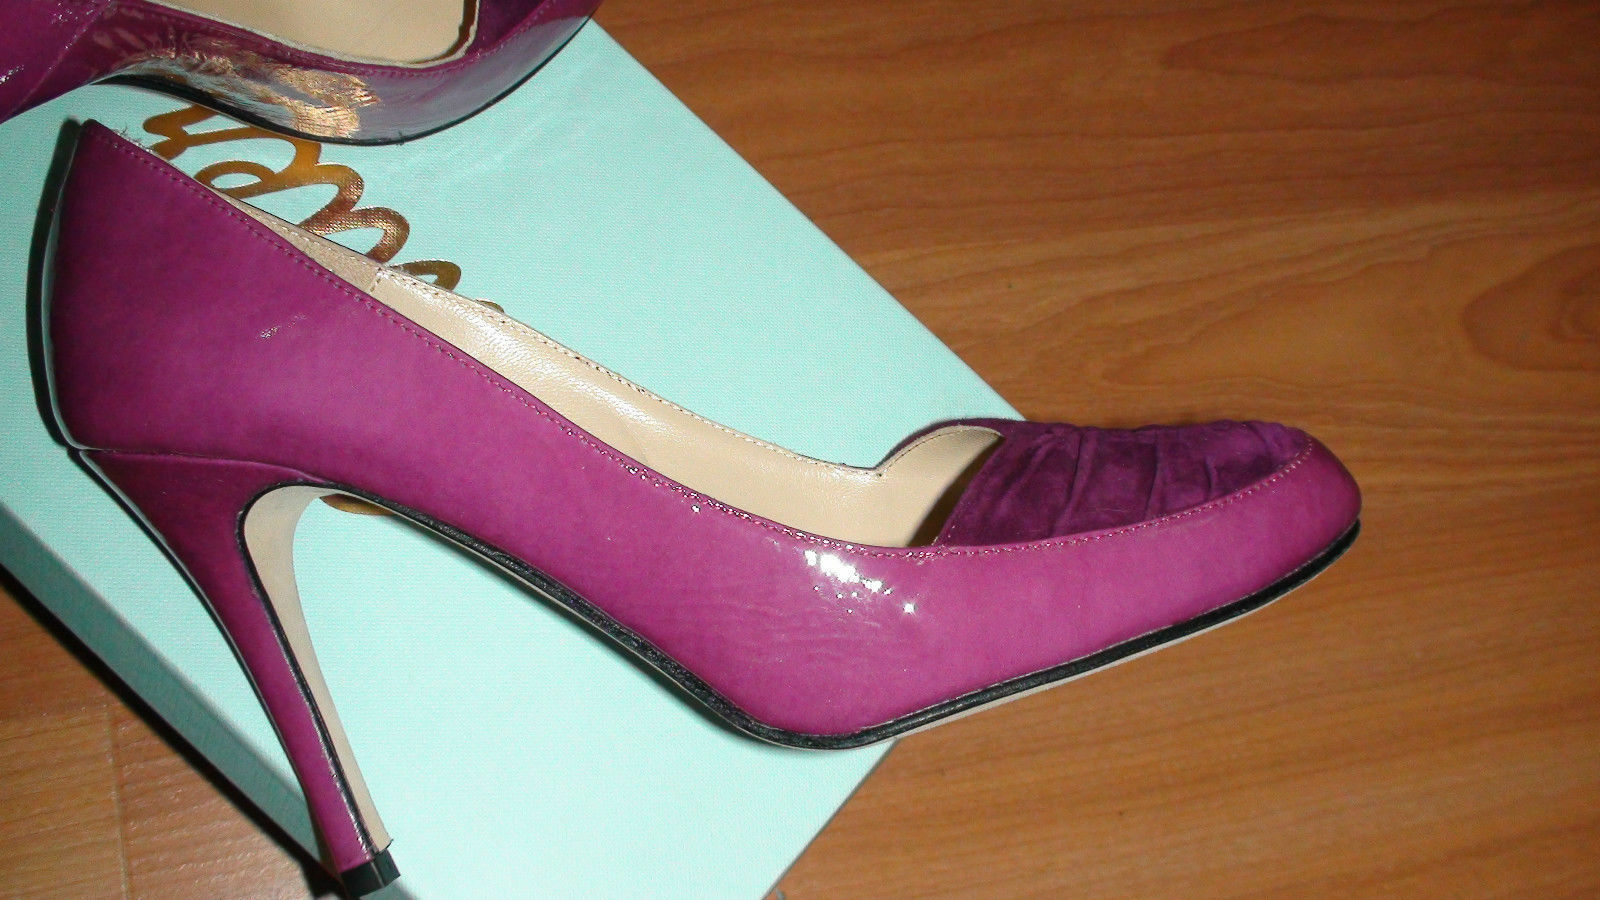 negozio online outlet NEW BUTTER PARKER PARKER PARKER viola donna scarpe sz. US 8 M MADE IN ITALY  sconti e altro